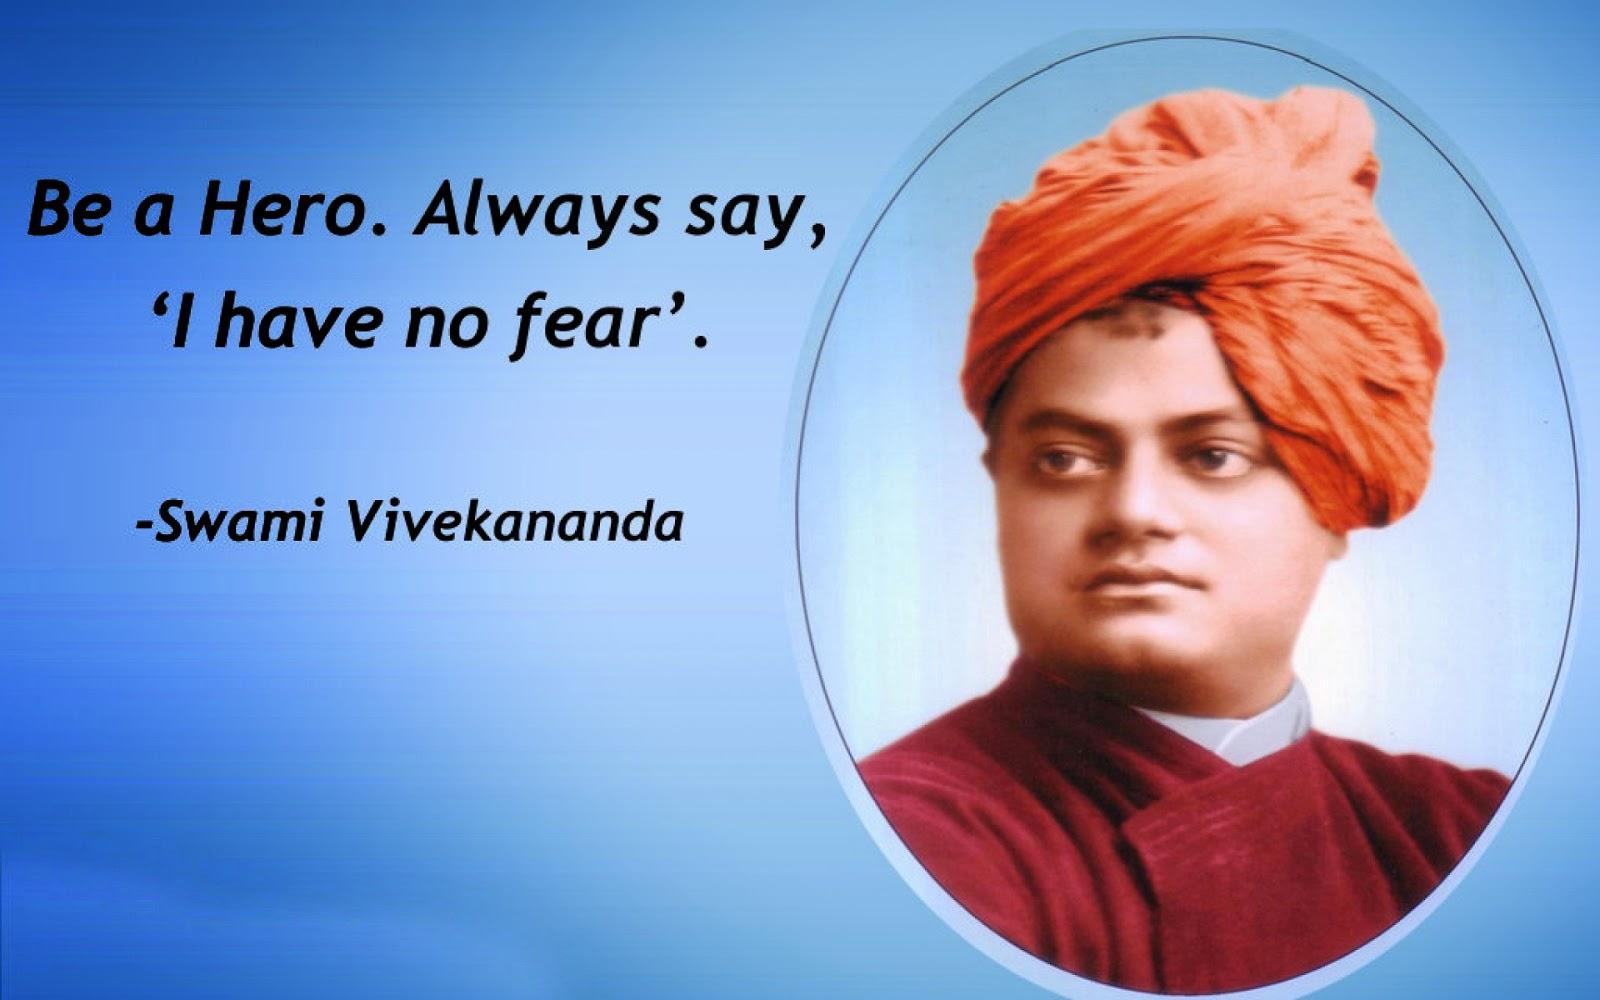 Vivekananda Reddy Hd: Be A Hero. Always Say, 'I Have No Fear'